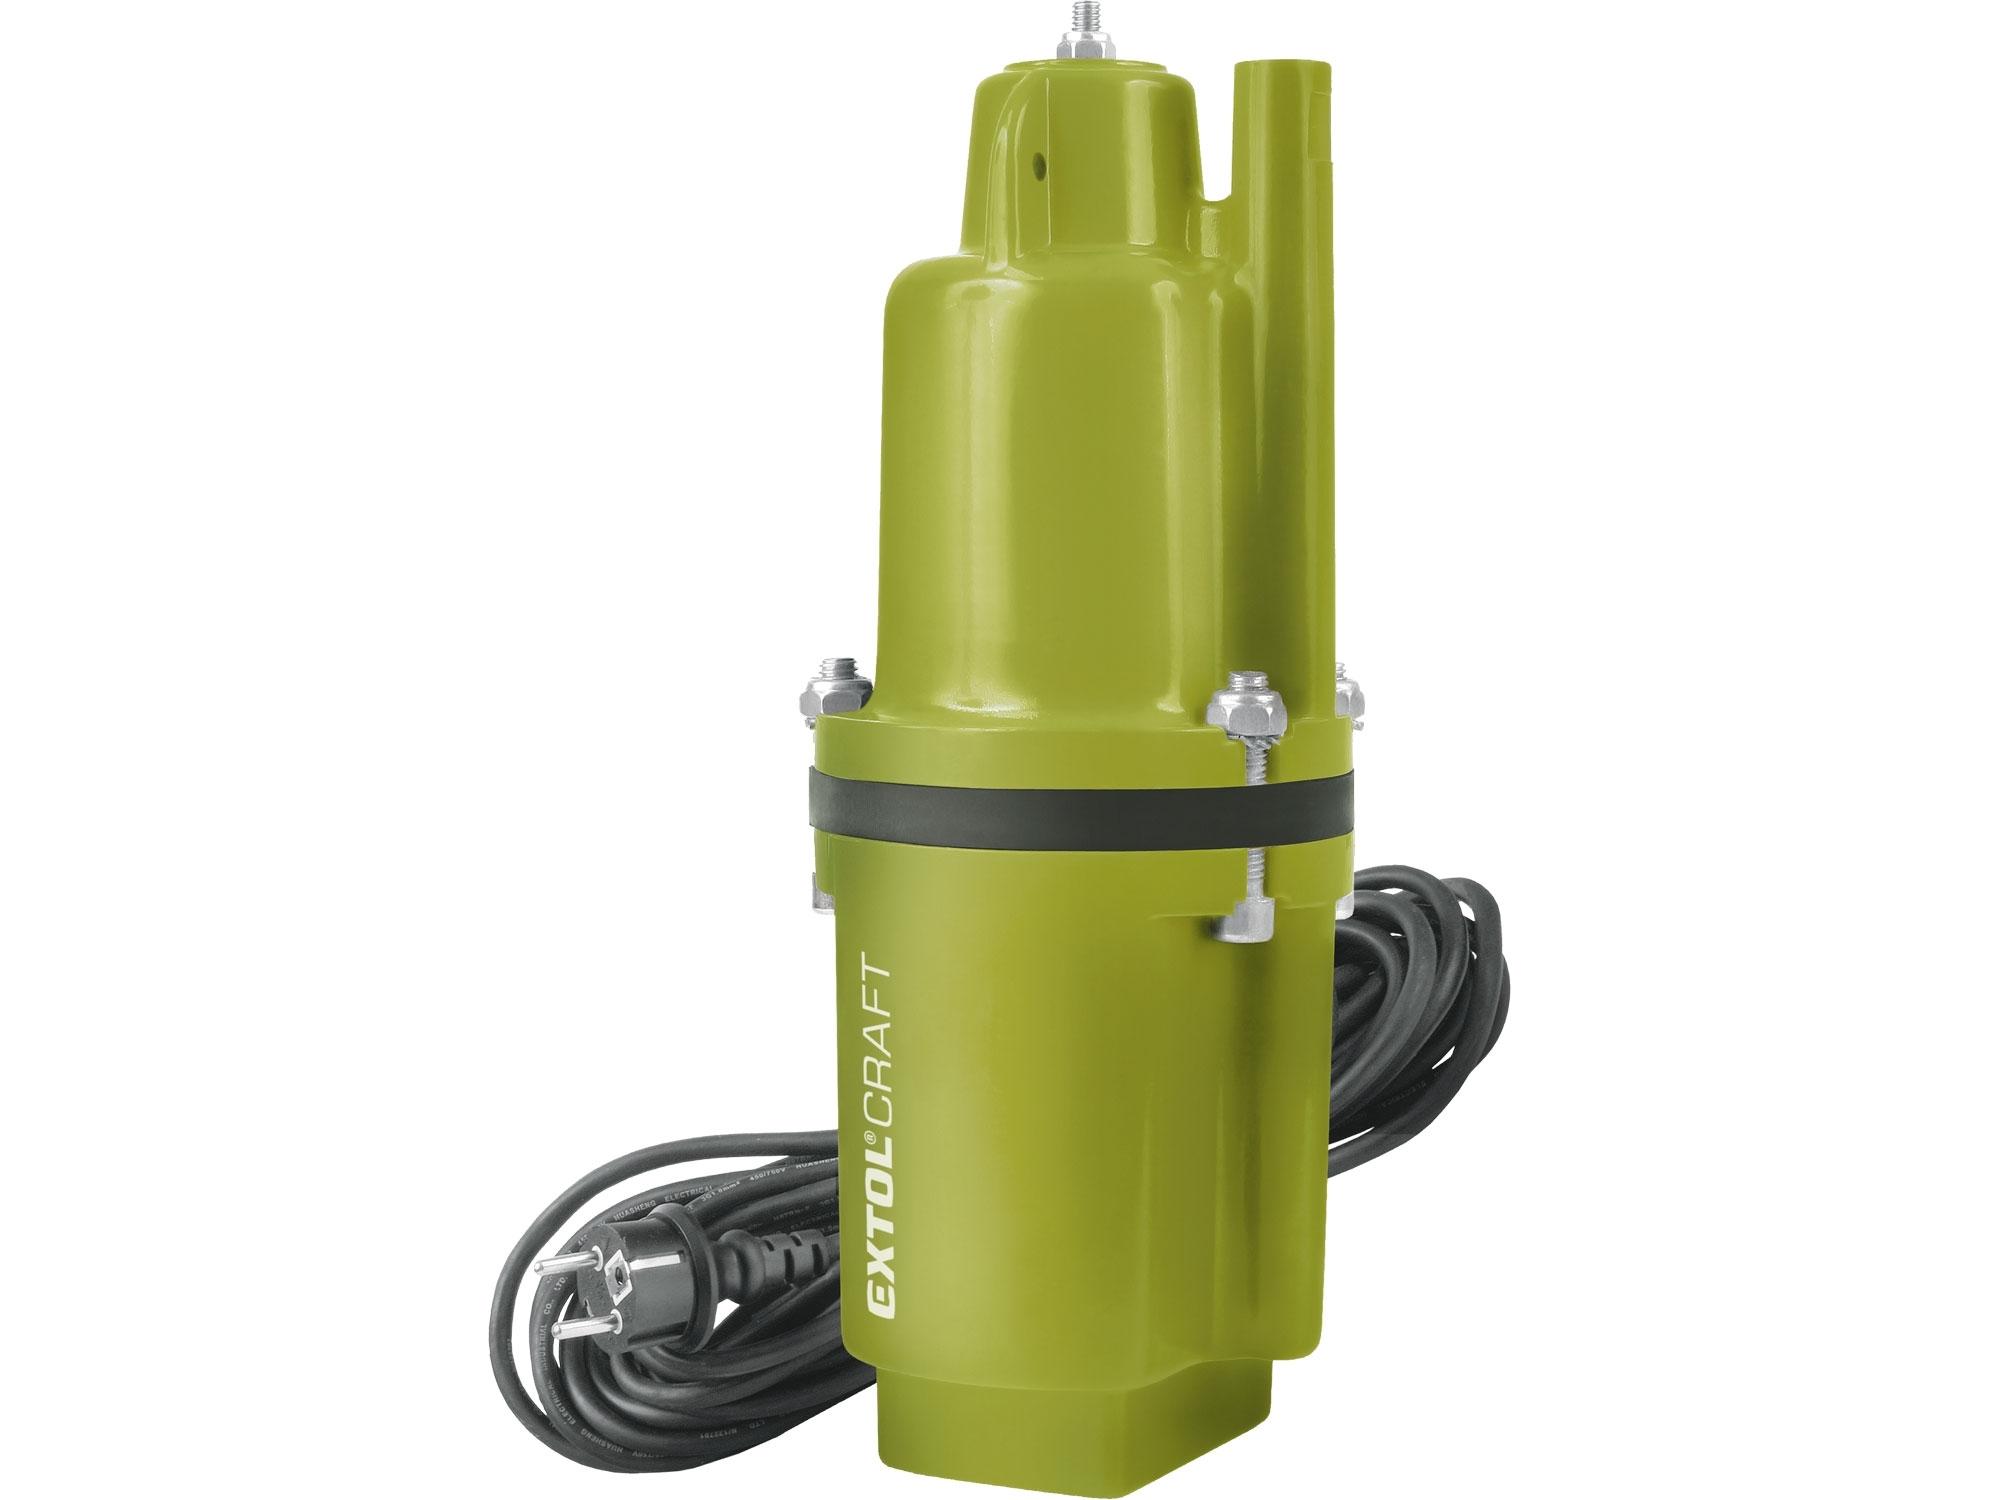 čerpadlo membránové hlubinné ponorné, 600W, 2000l/hod, 10m, EXTOL CRAFT 414175